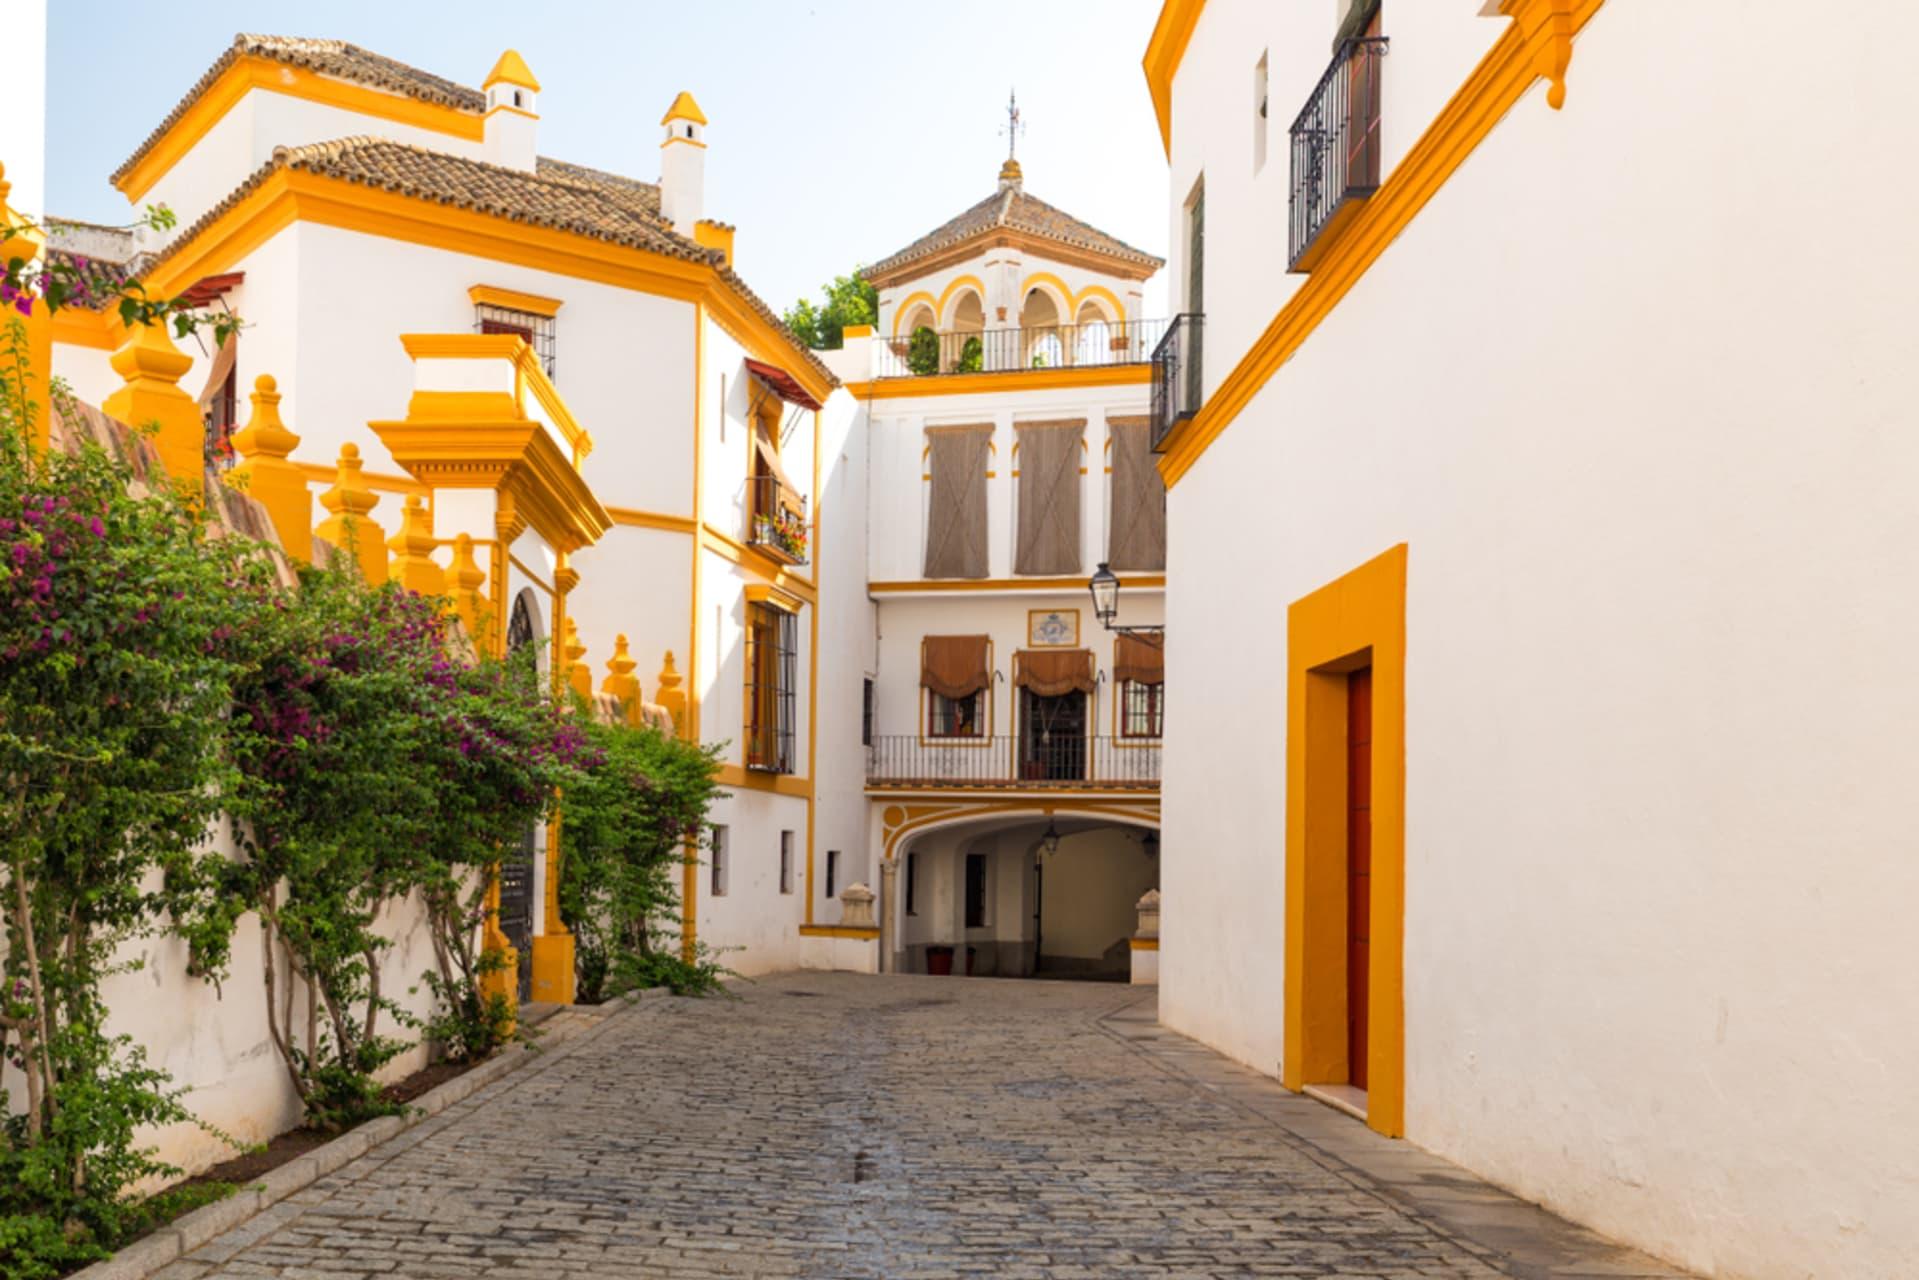 Seville - The Old Jewish Quarter: Santa Cruz Neighborhood Sevilla, Spain